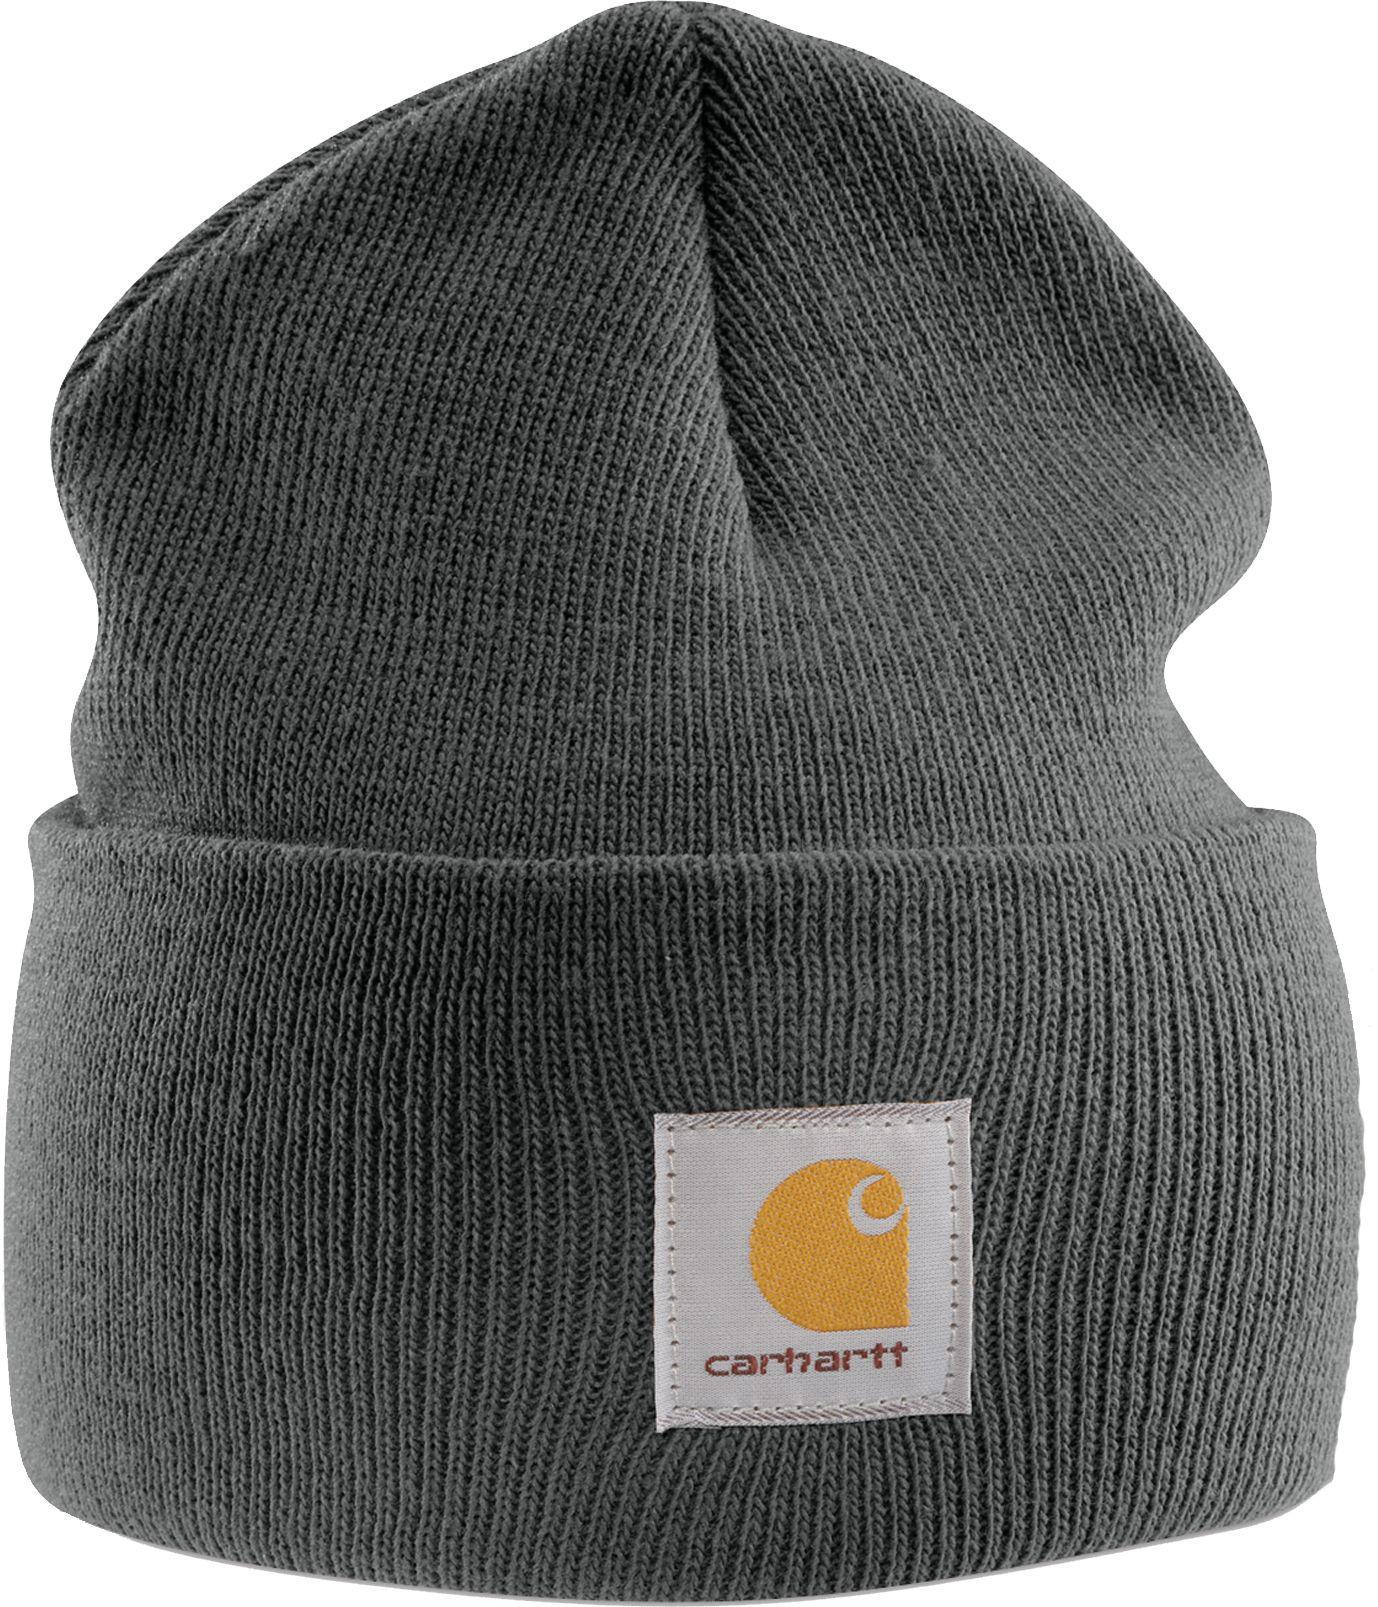 fbb6cbfbe57 View fullscreen · Carhartt - Multicolor Knit Watch Cap for Men - Lyst